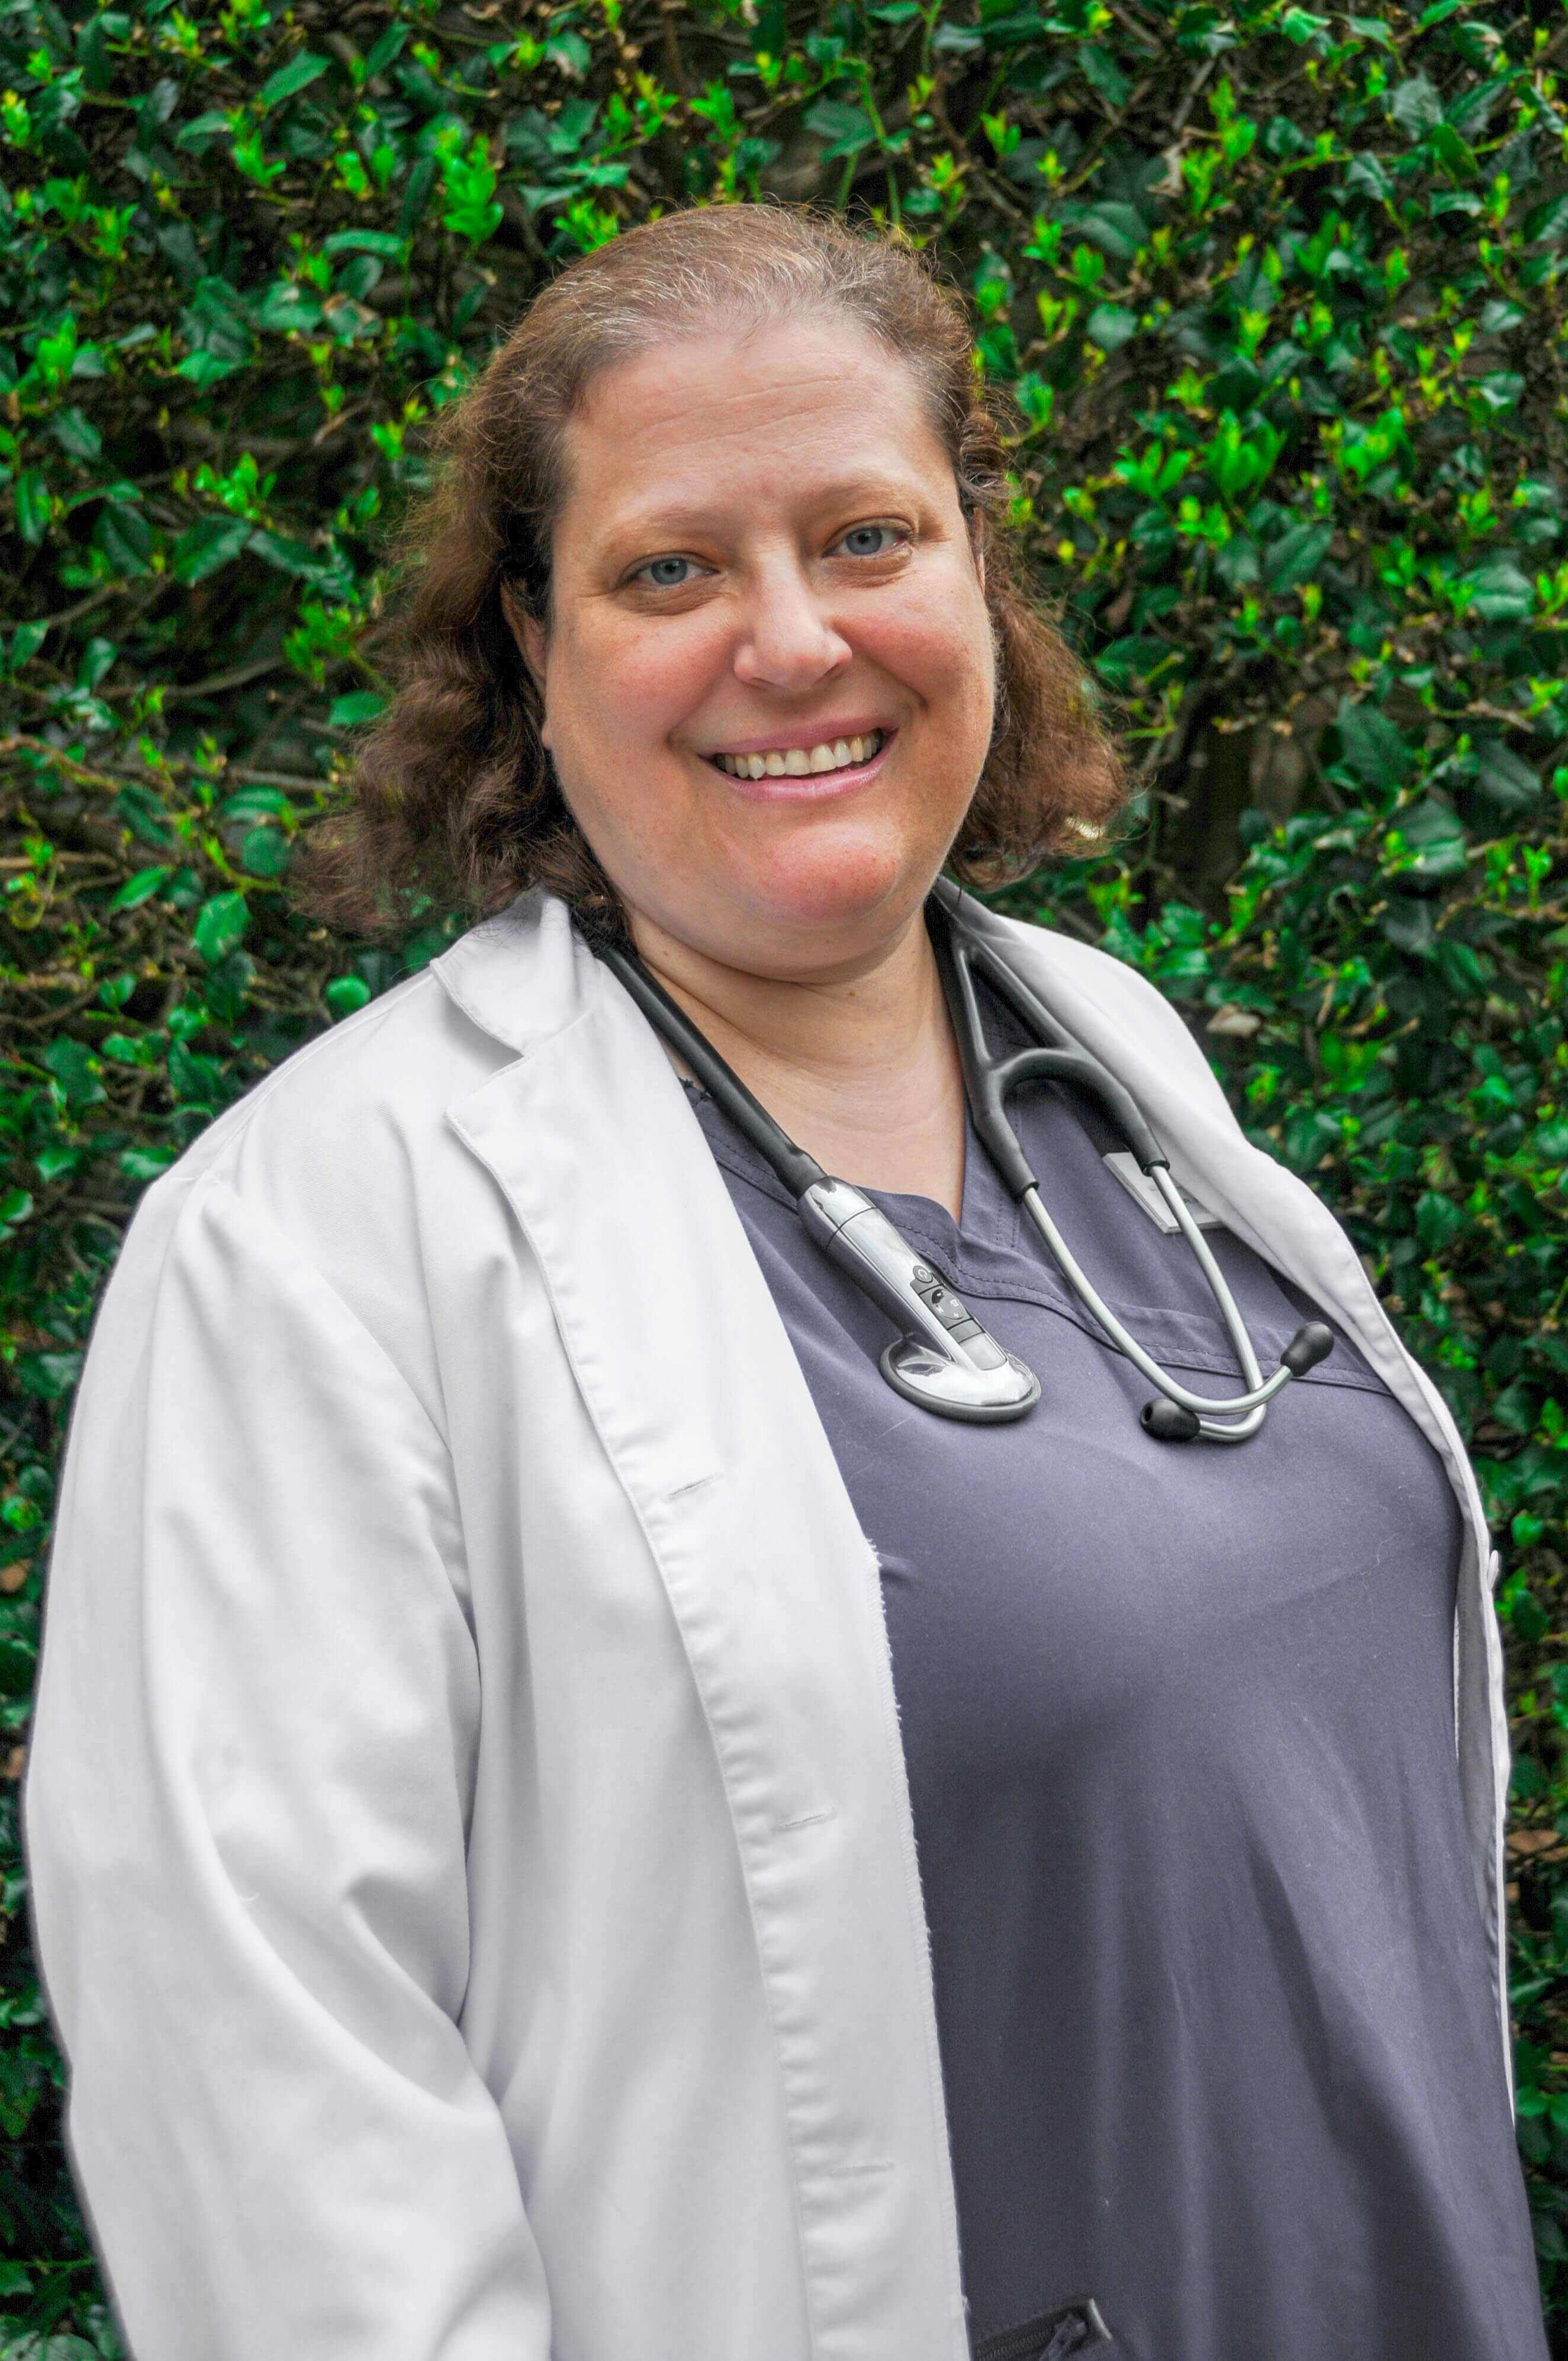 Dr. Merryl Reiss